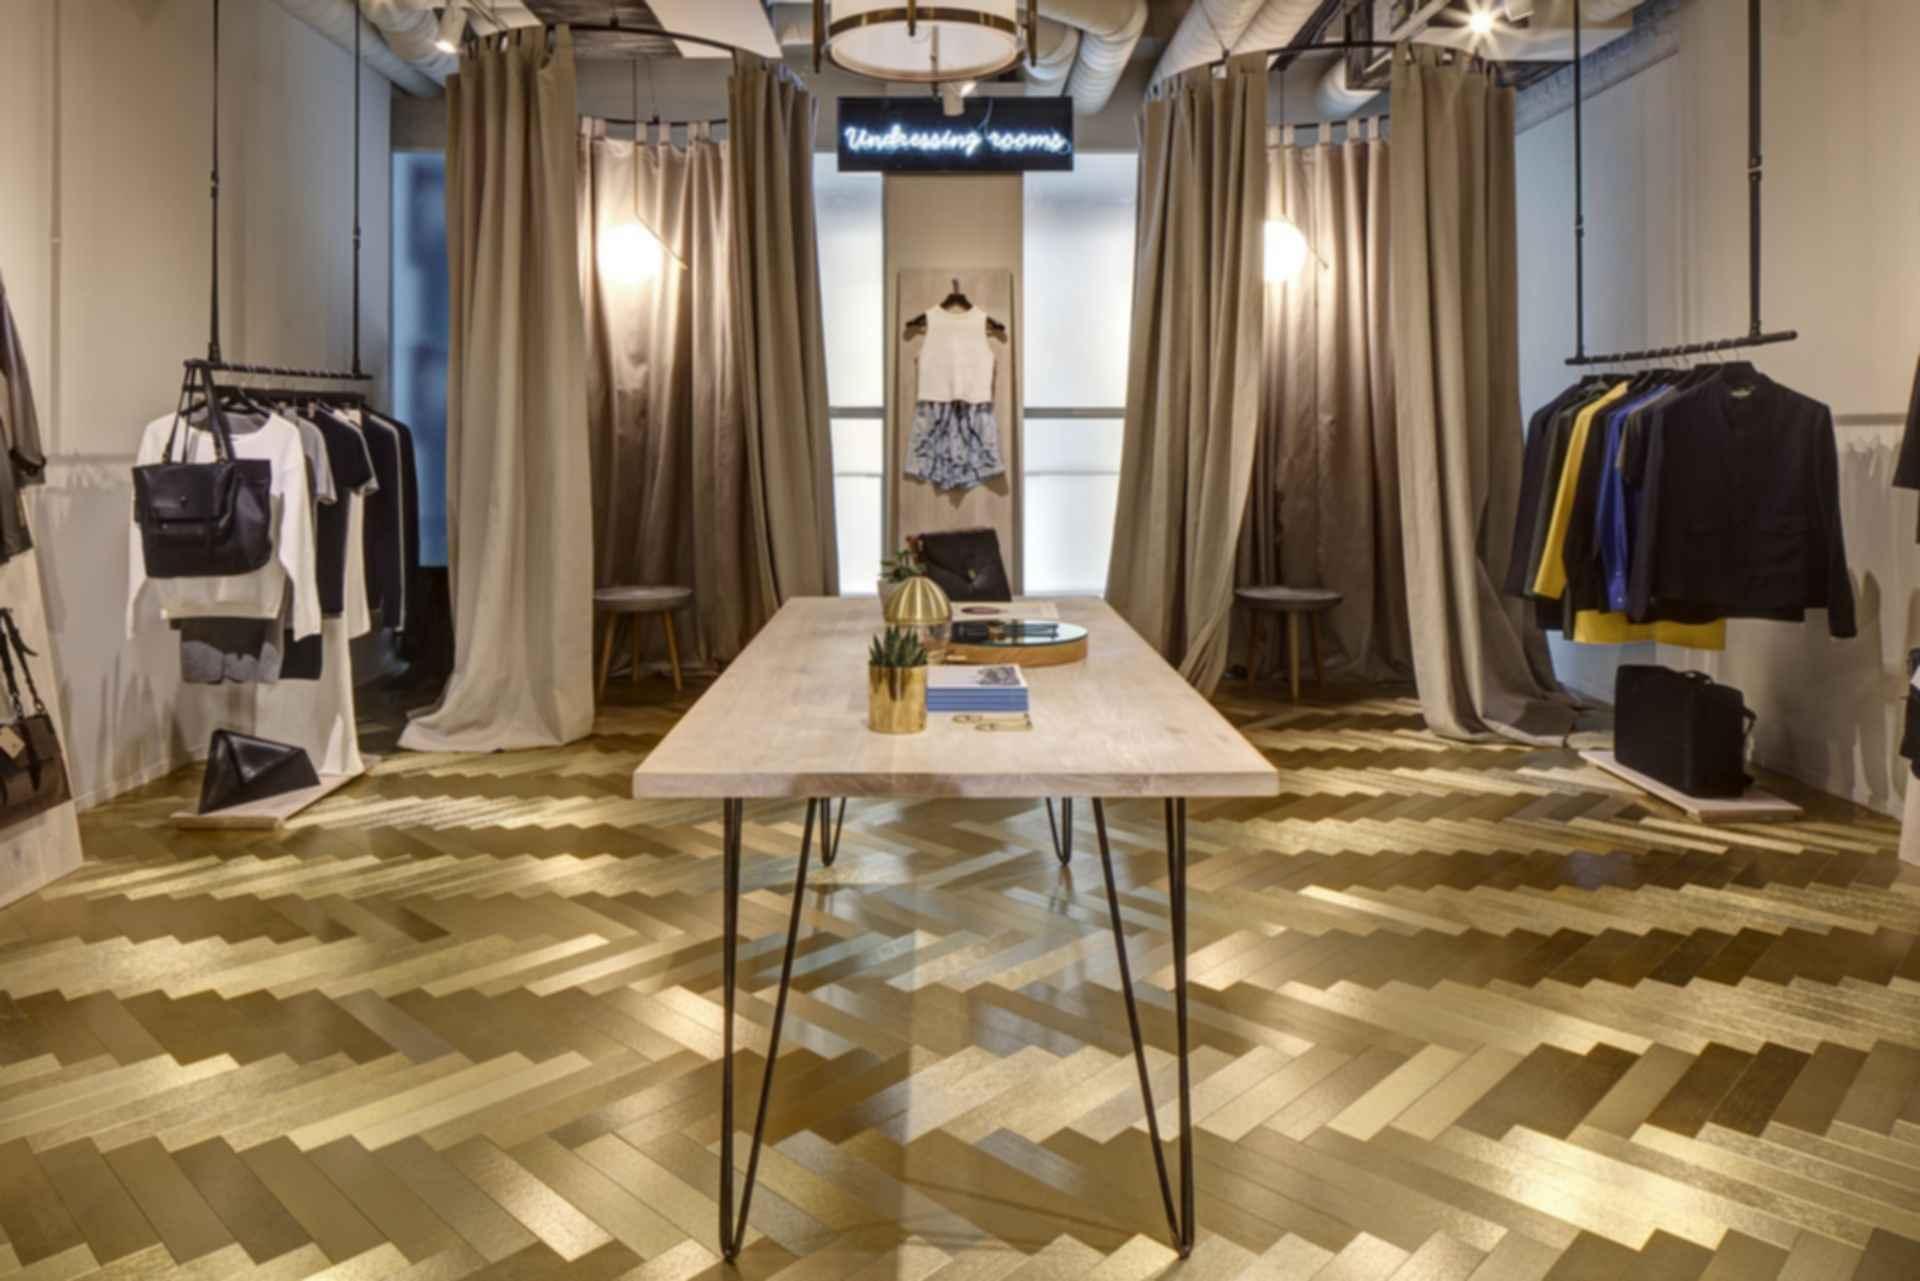 Clerkenwell London - Dressing Rooms